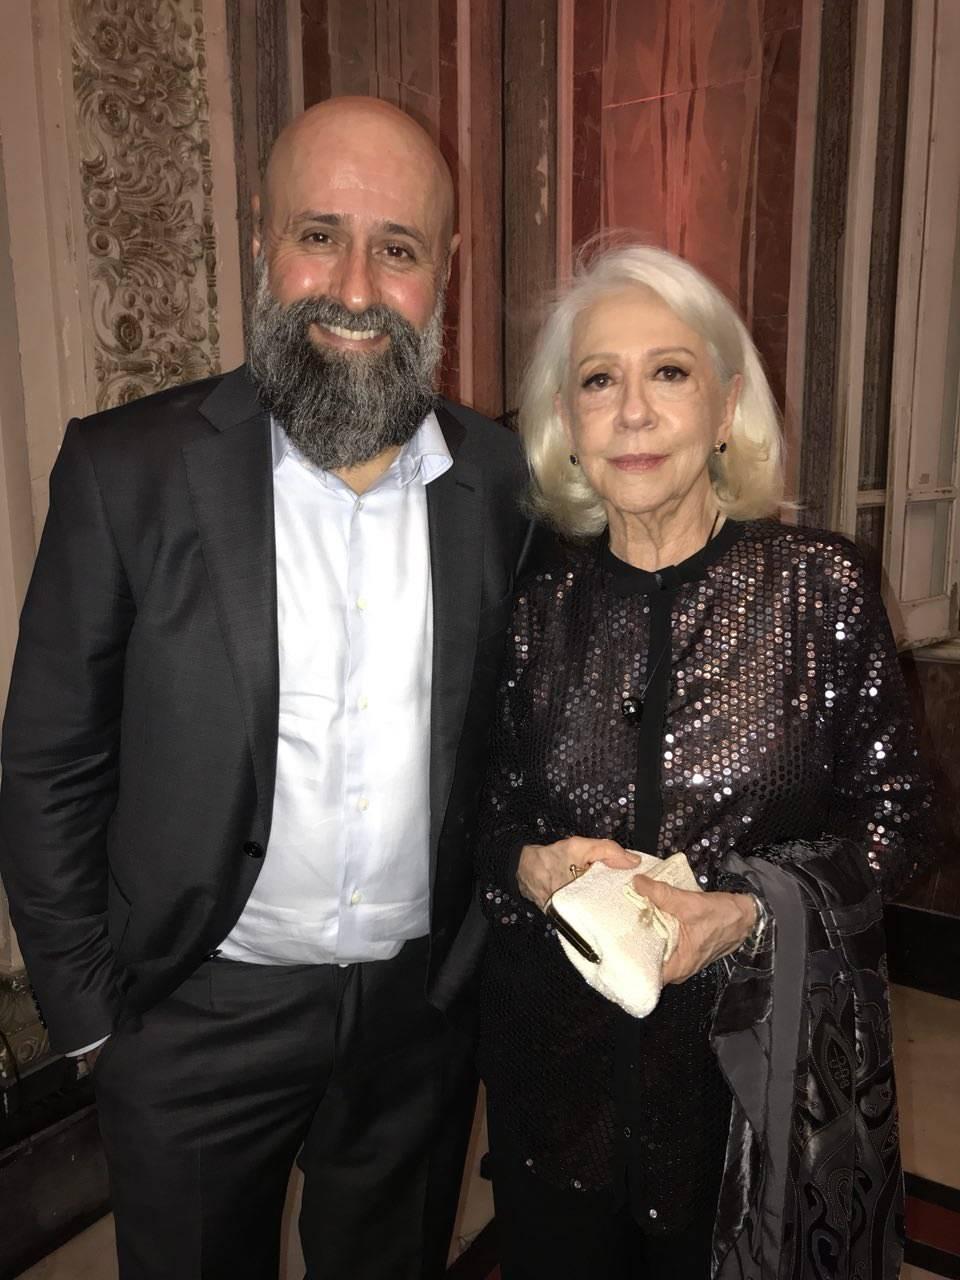 Mauro Mendonça Filho e Fernanda Montenegro